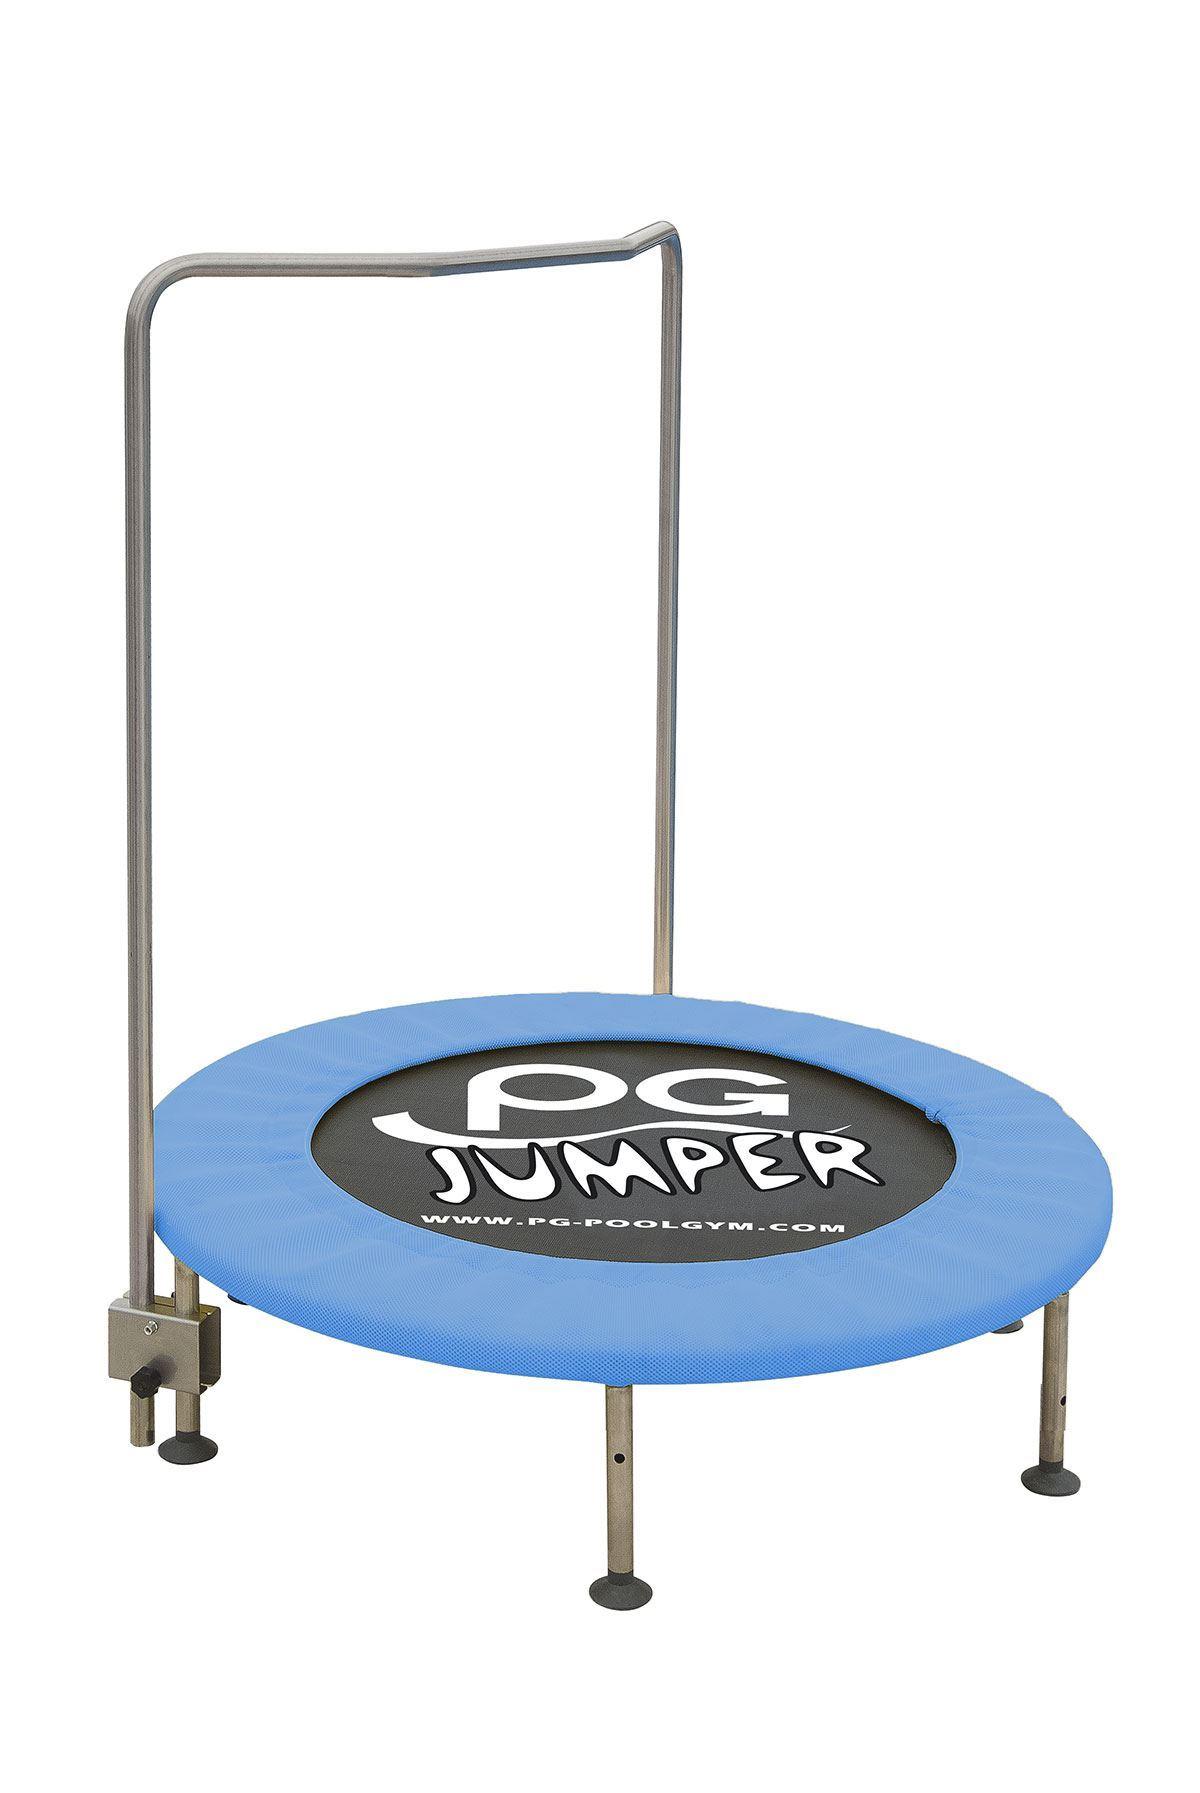 206102 - AQUA PHYSIO JUMPER